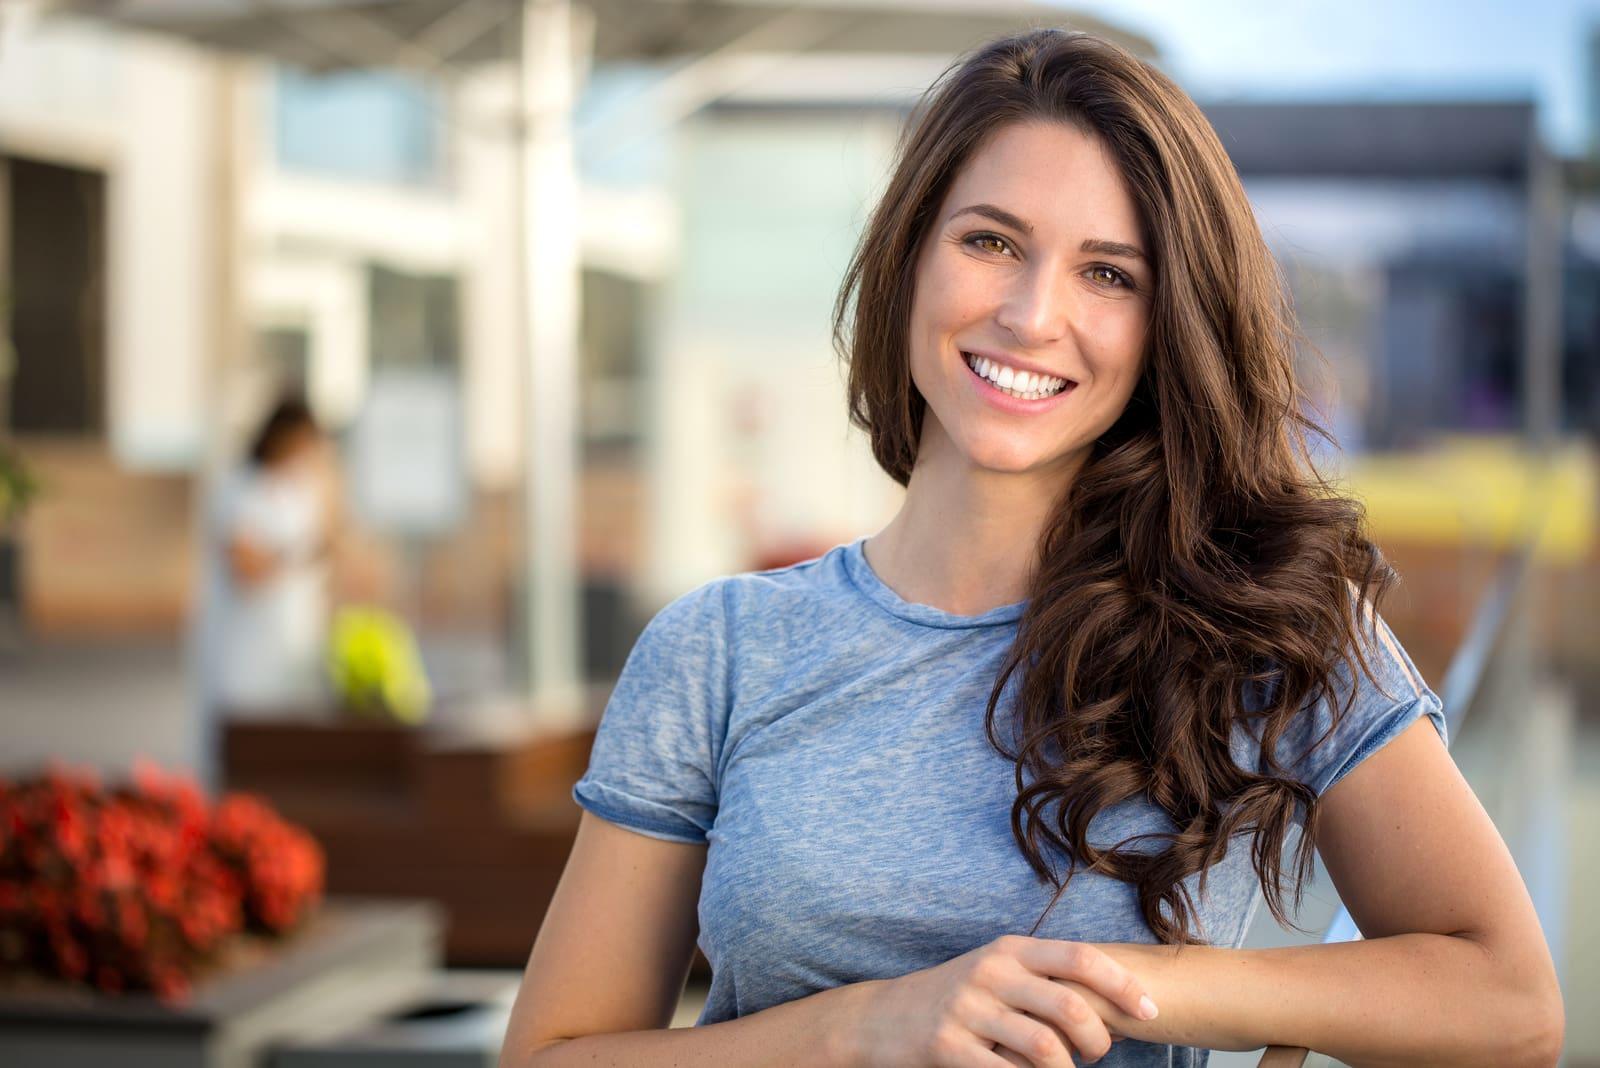 happy brunette smiling